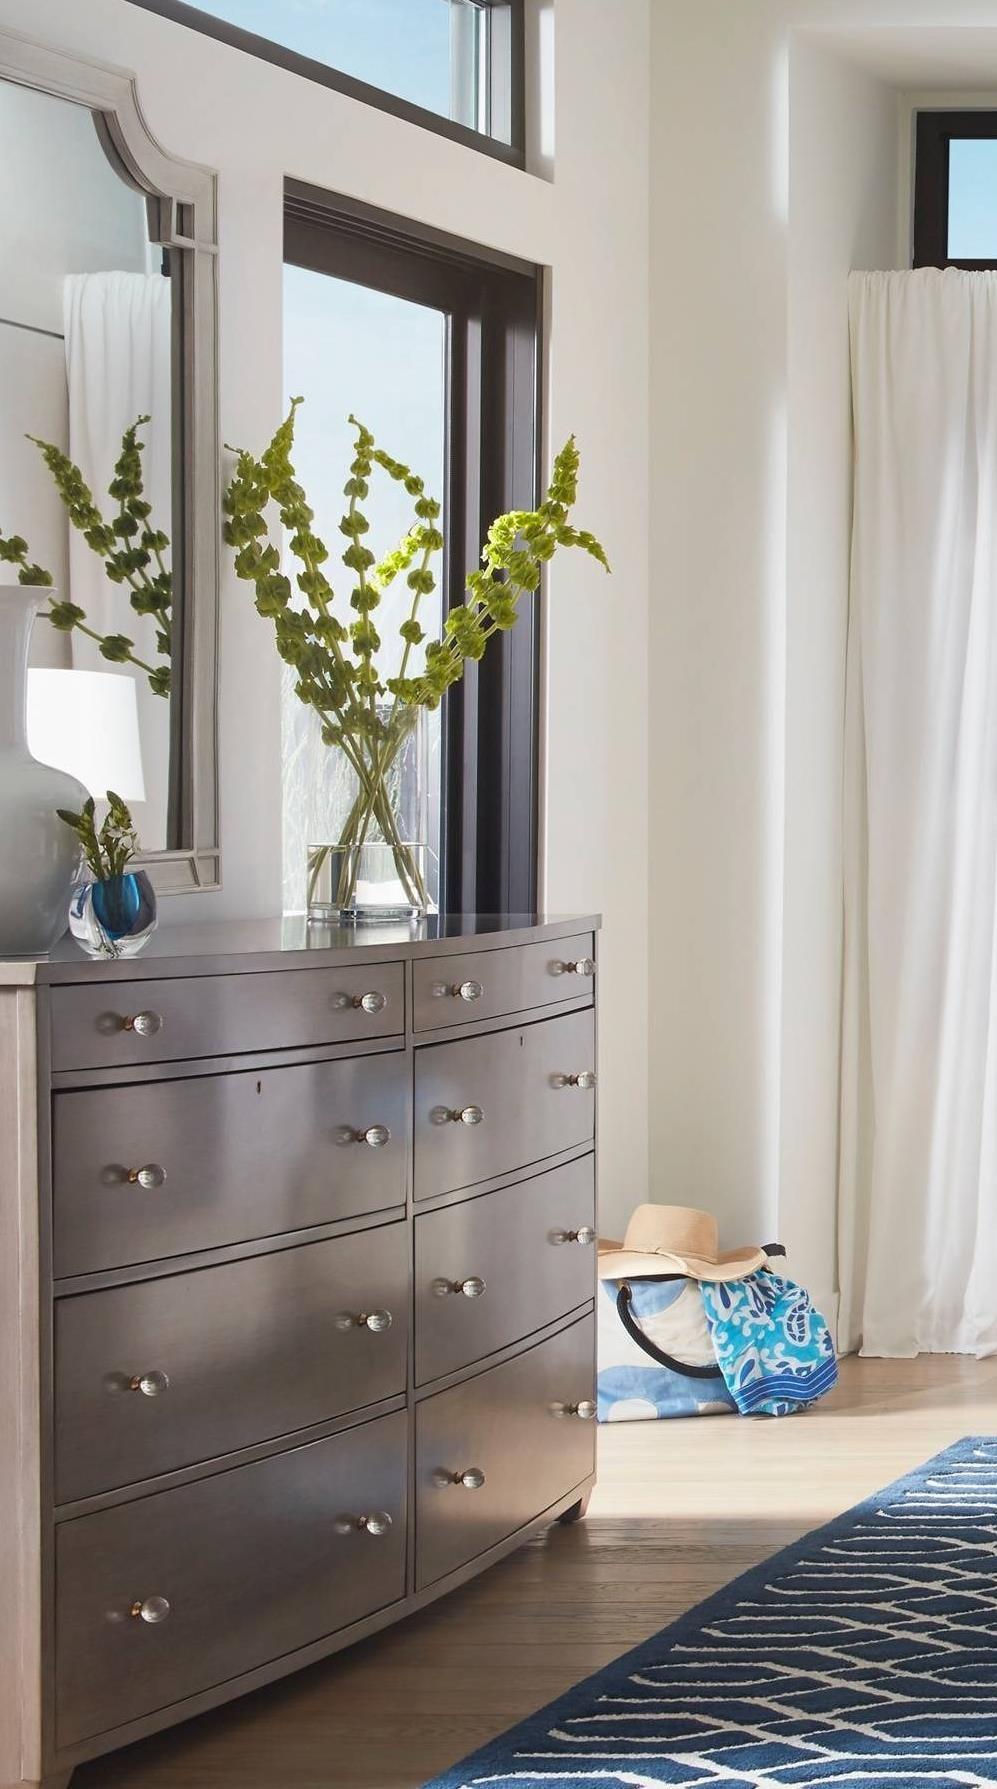 Stanley Furniture Coastal Living Oasis Ocean Park Dresser & Silver Lake Mirror - Item Number: 527-63-06+53-30